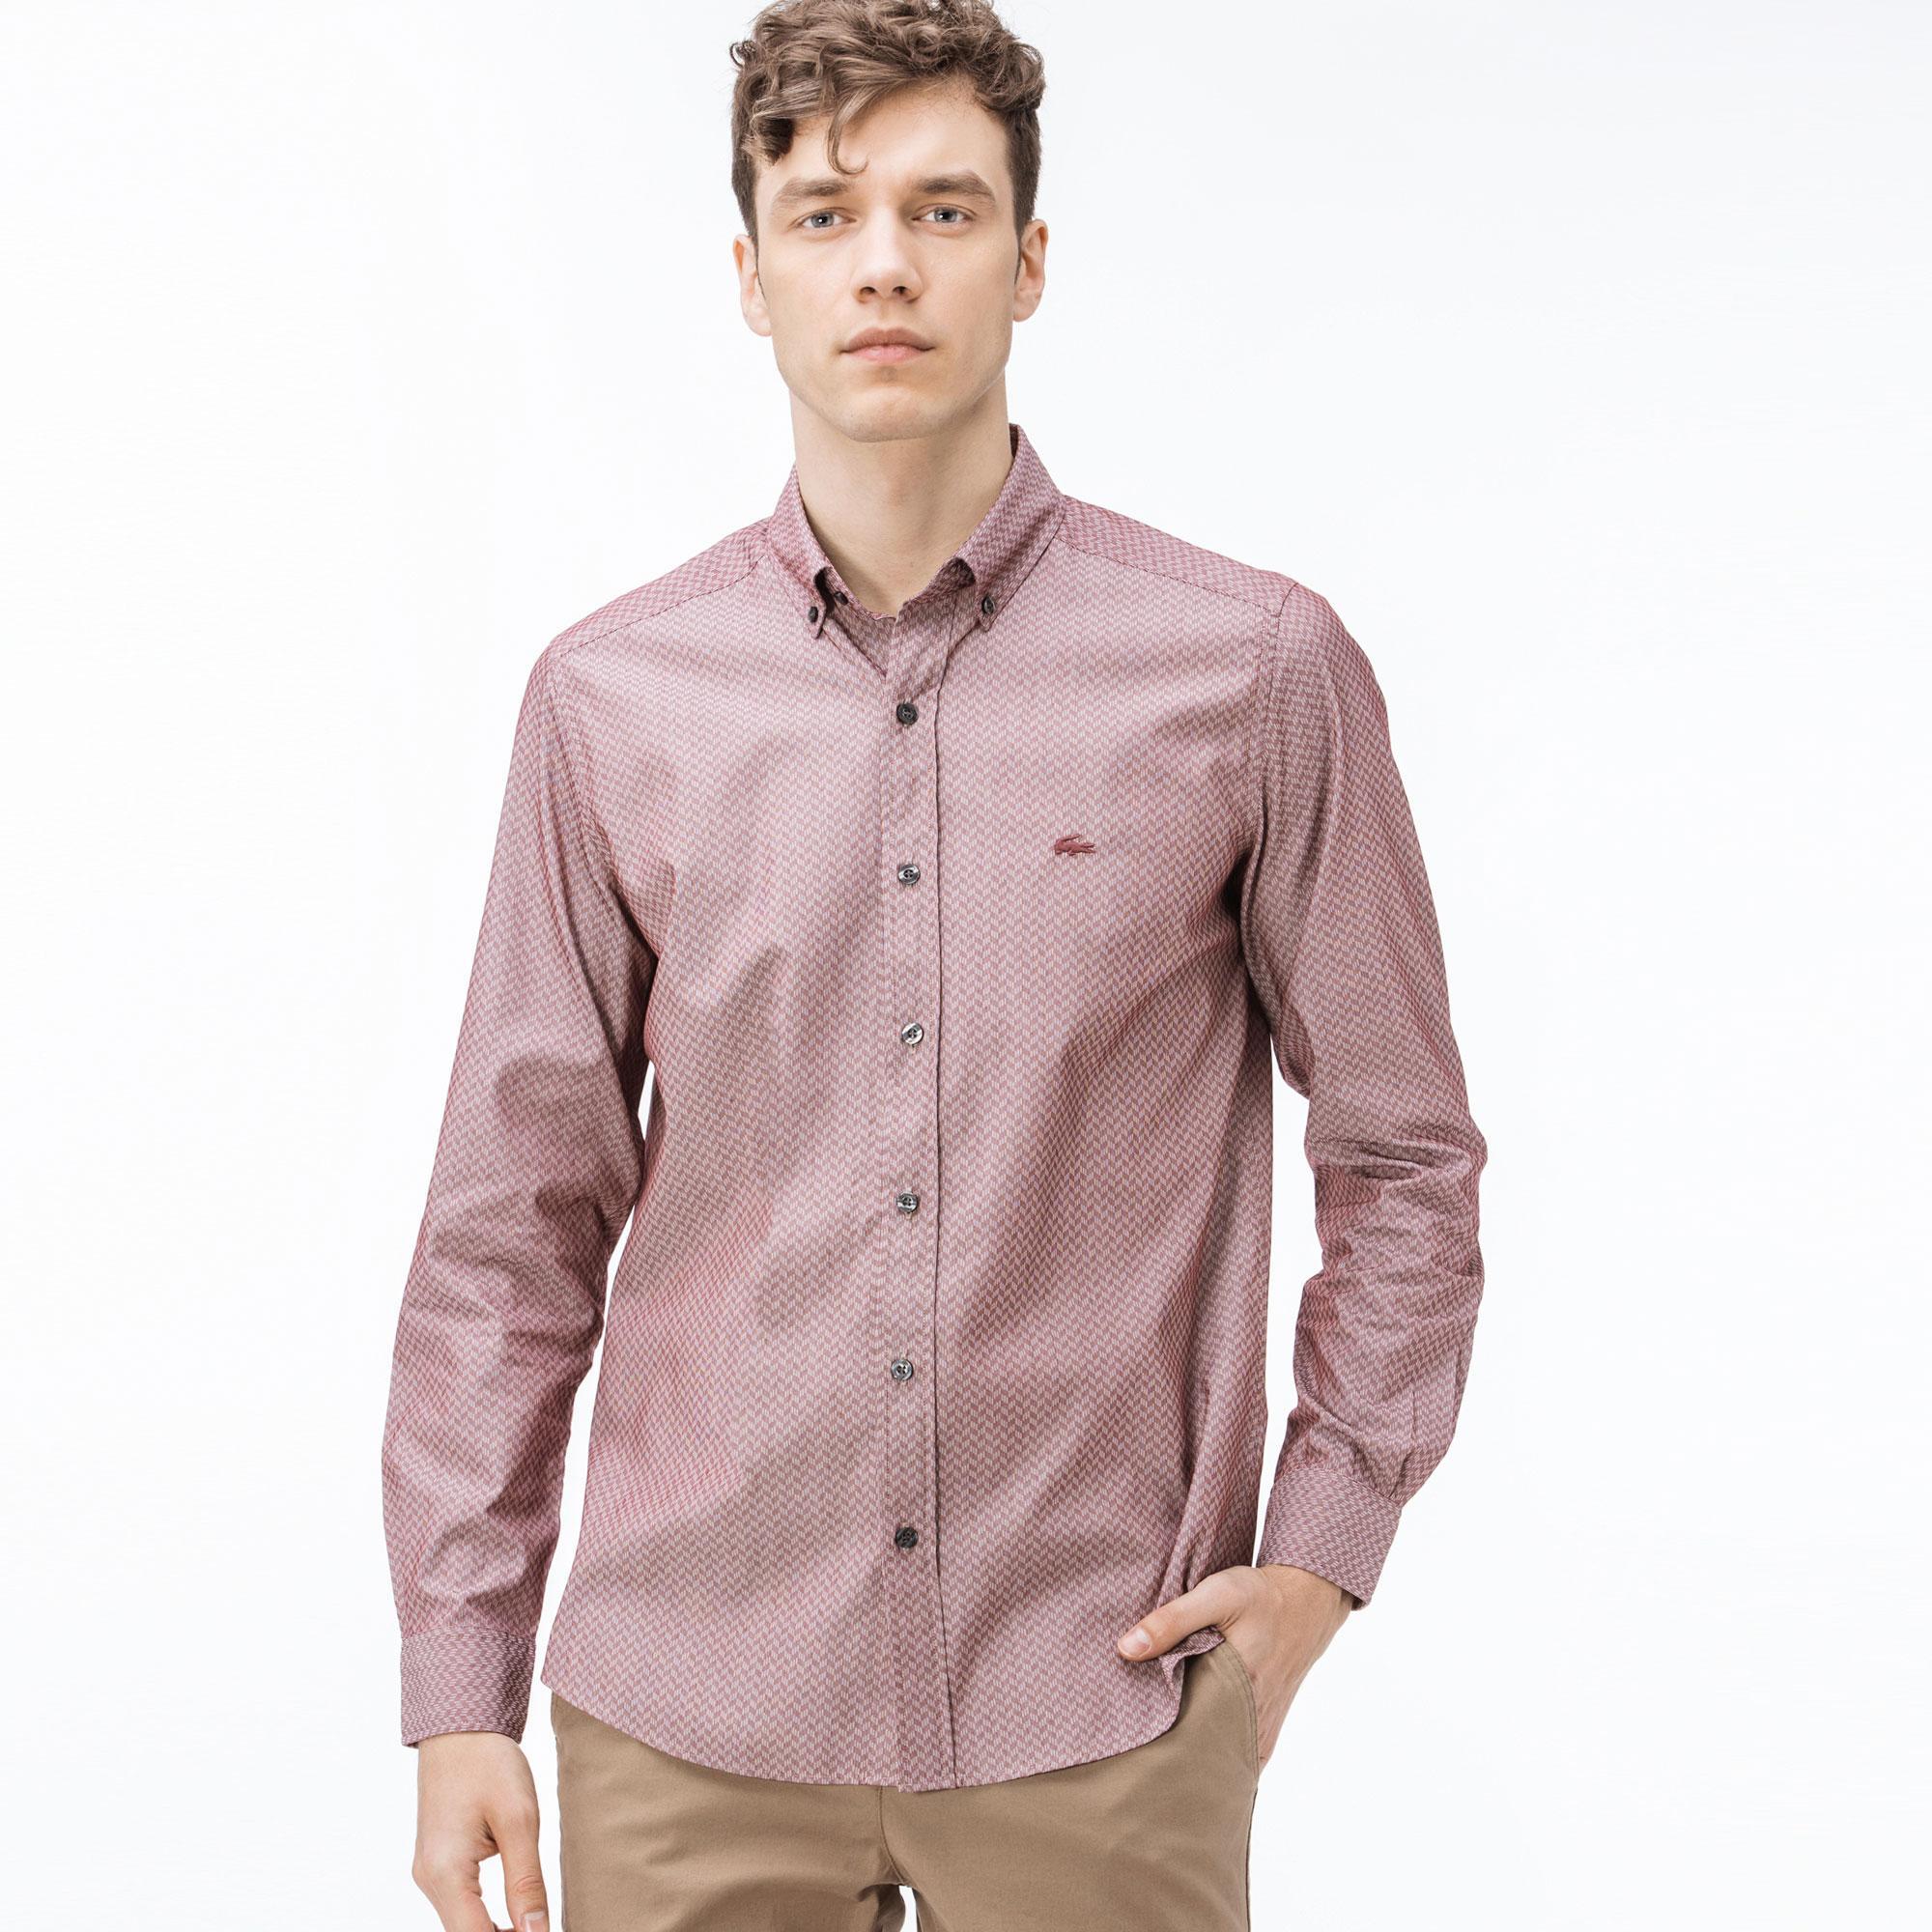 Lacoste Erkek Slim Fit Bordo Gömlek